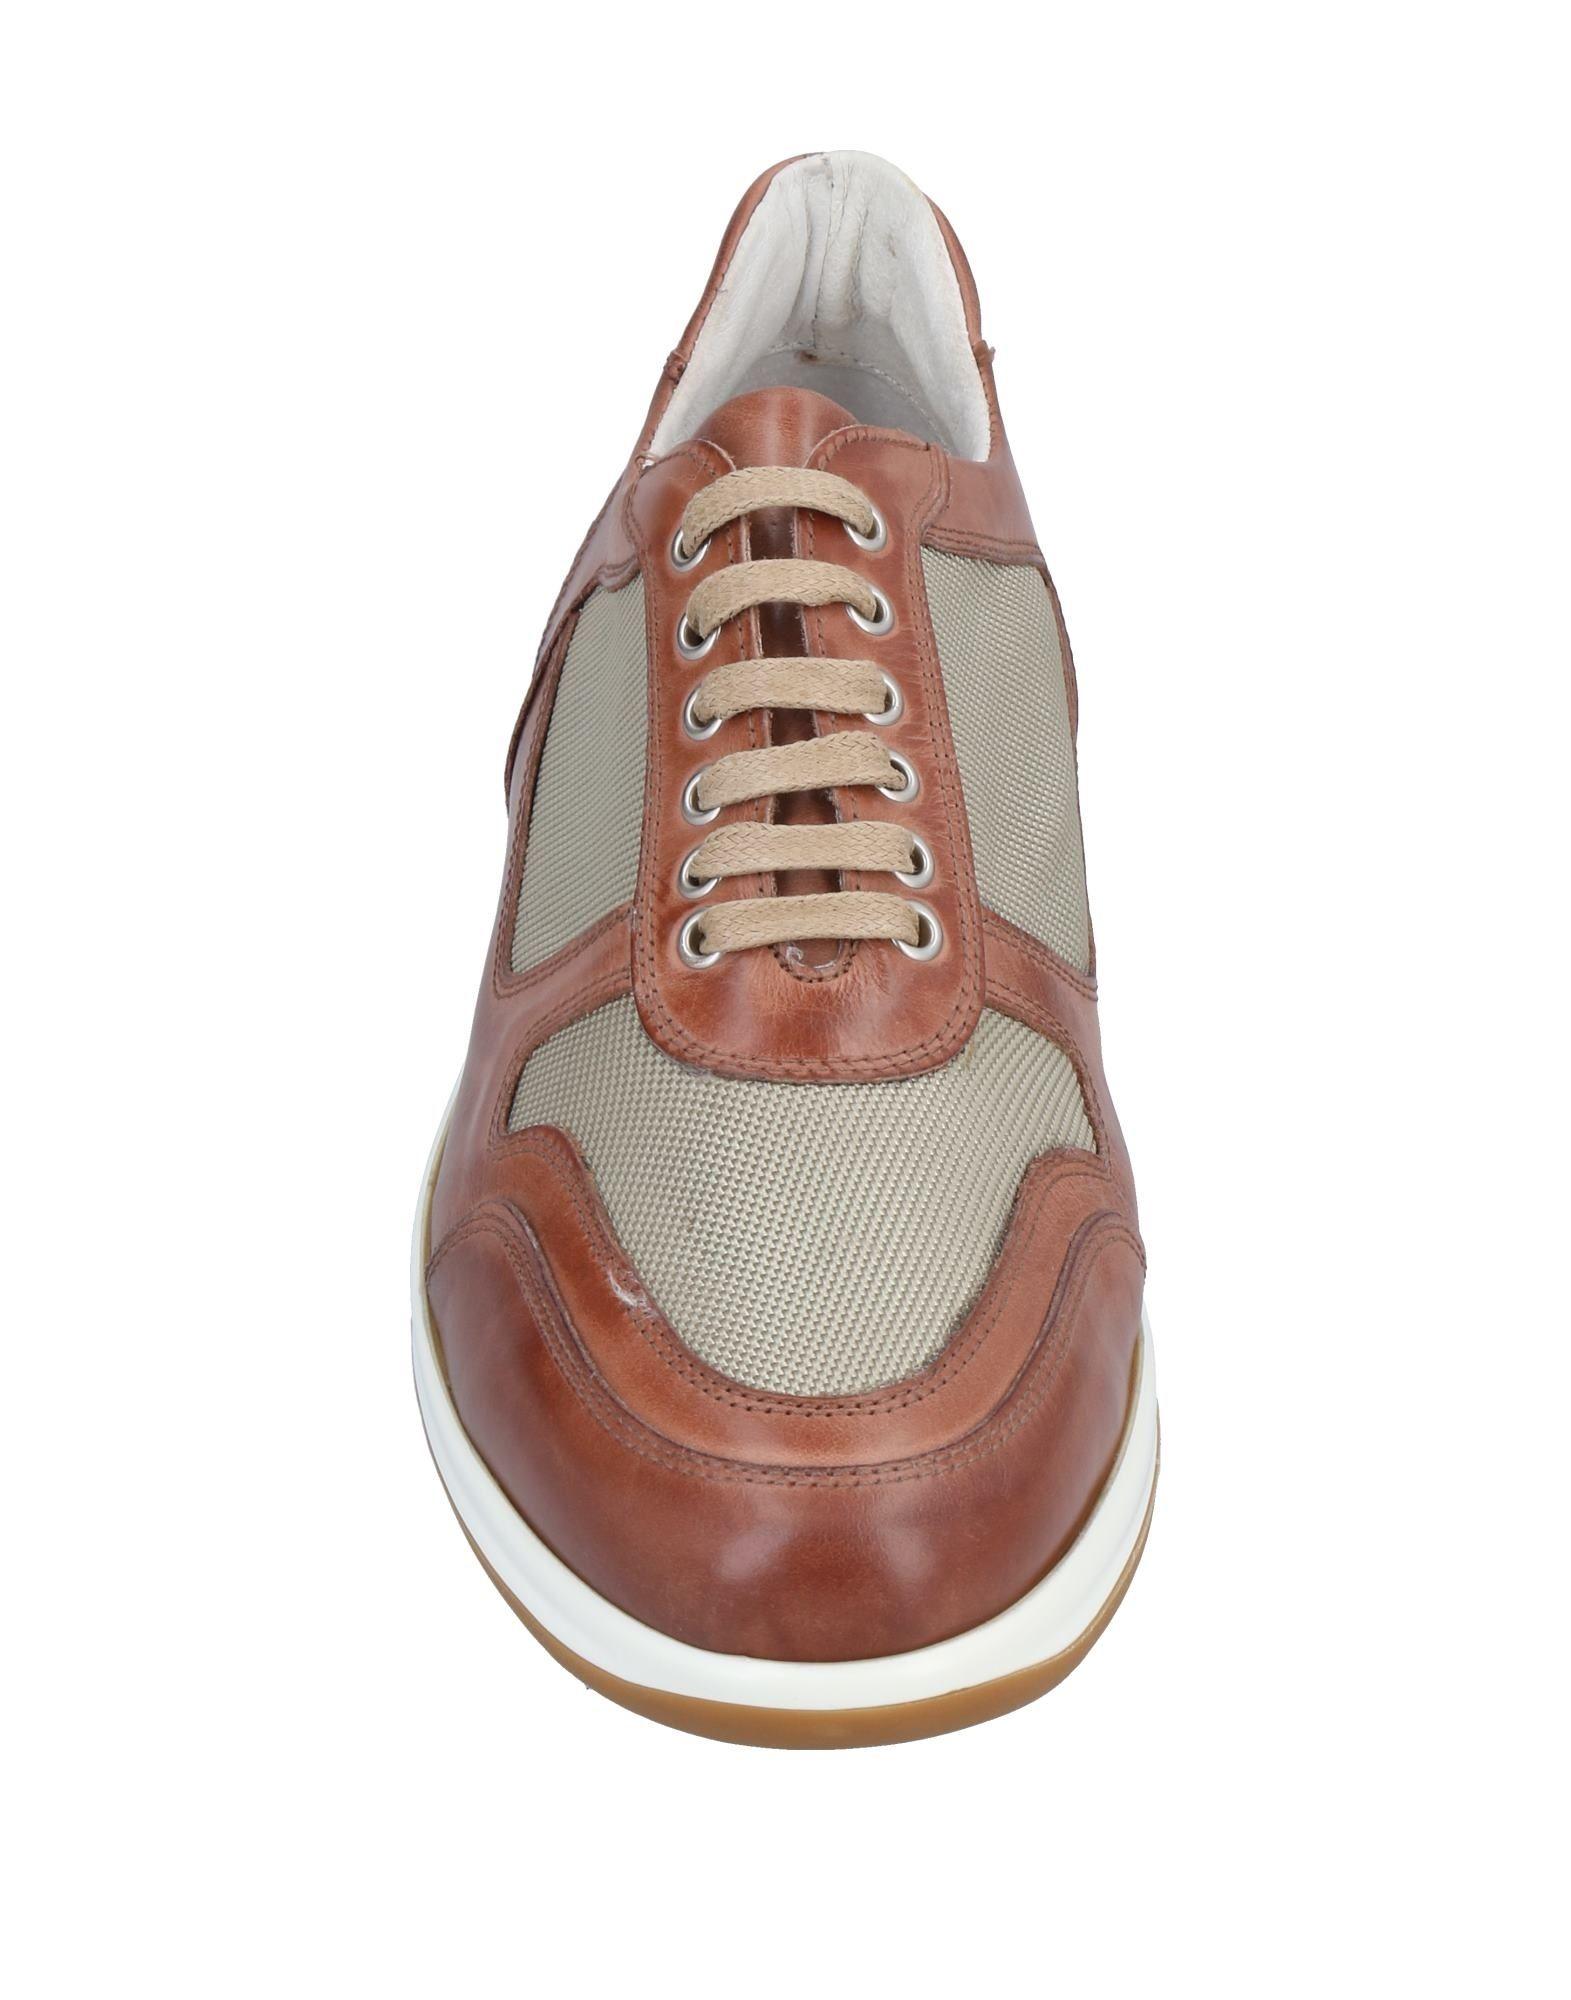 Salvo Barone Sneakers - Men Salvo Barone Barone Barone Sneakers online on  United Kingdom - 11556931UI 41e329